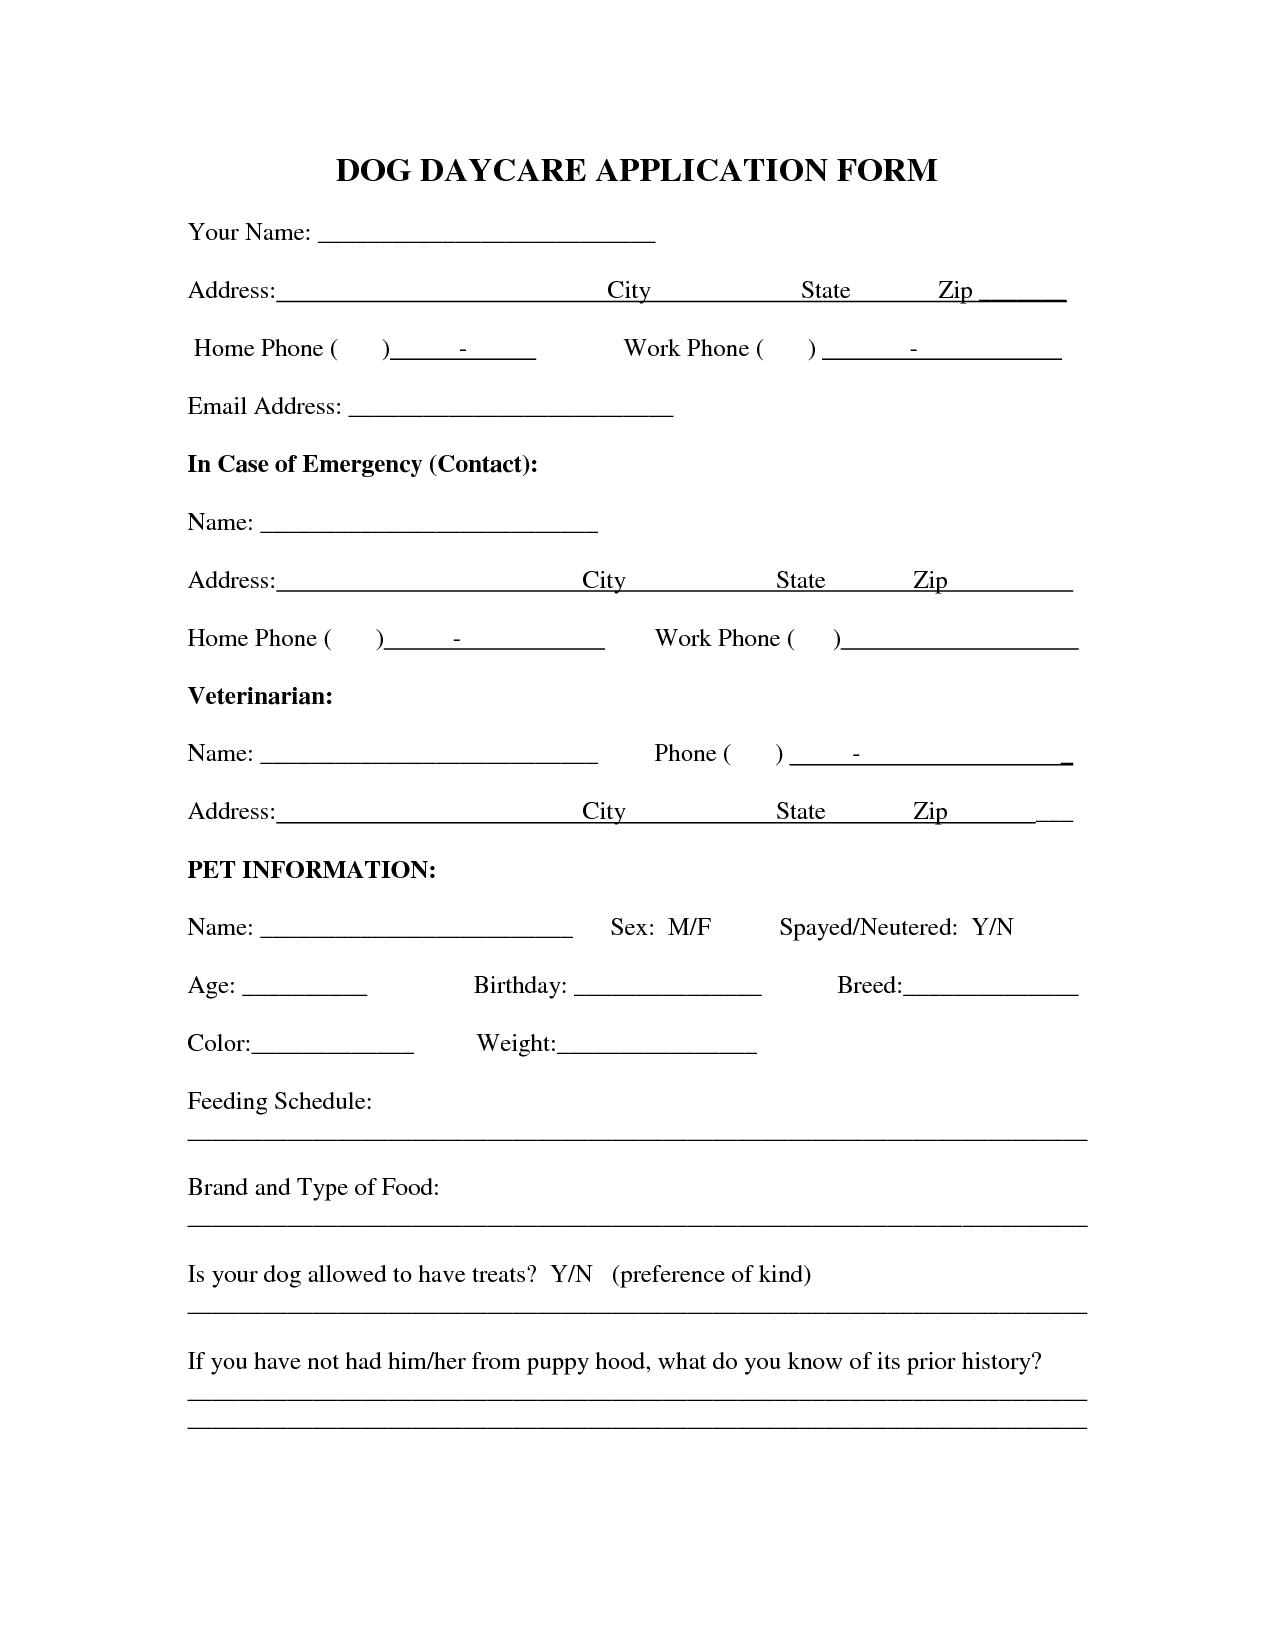 Dog Daycare Schedule Dog Daycare Application Form More